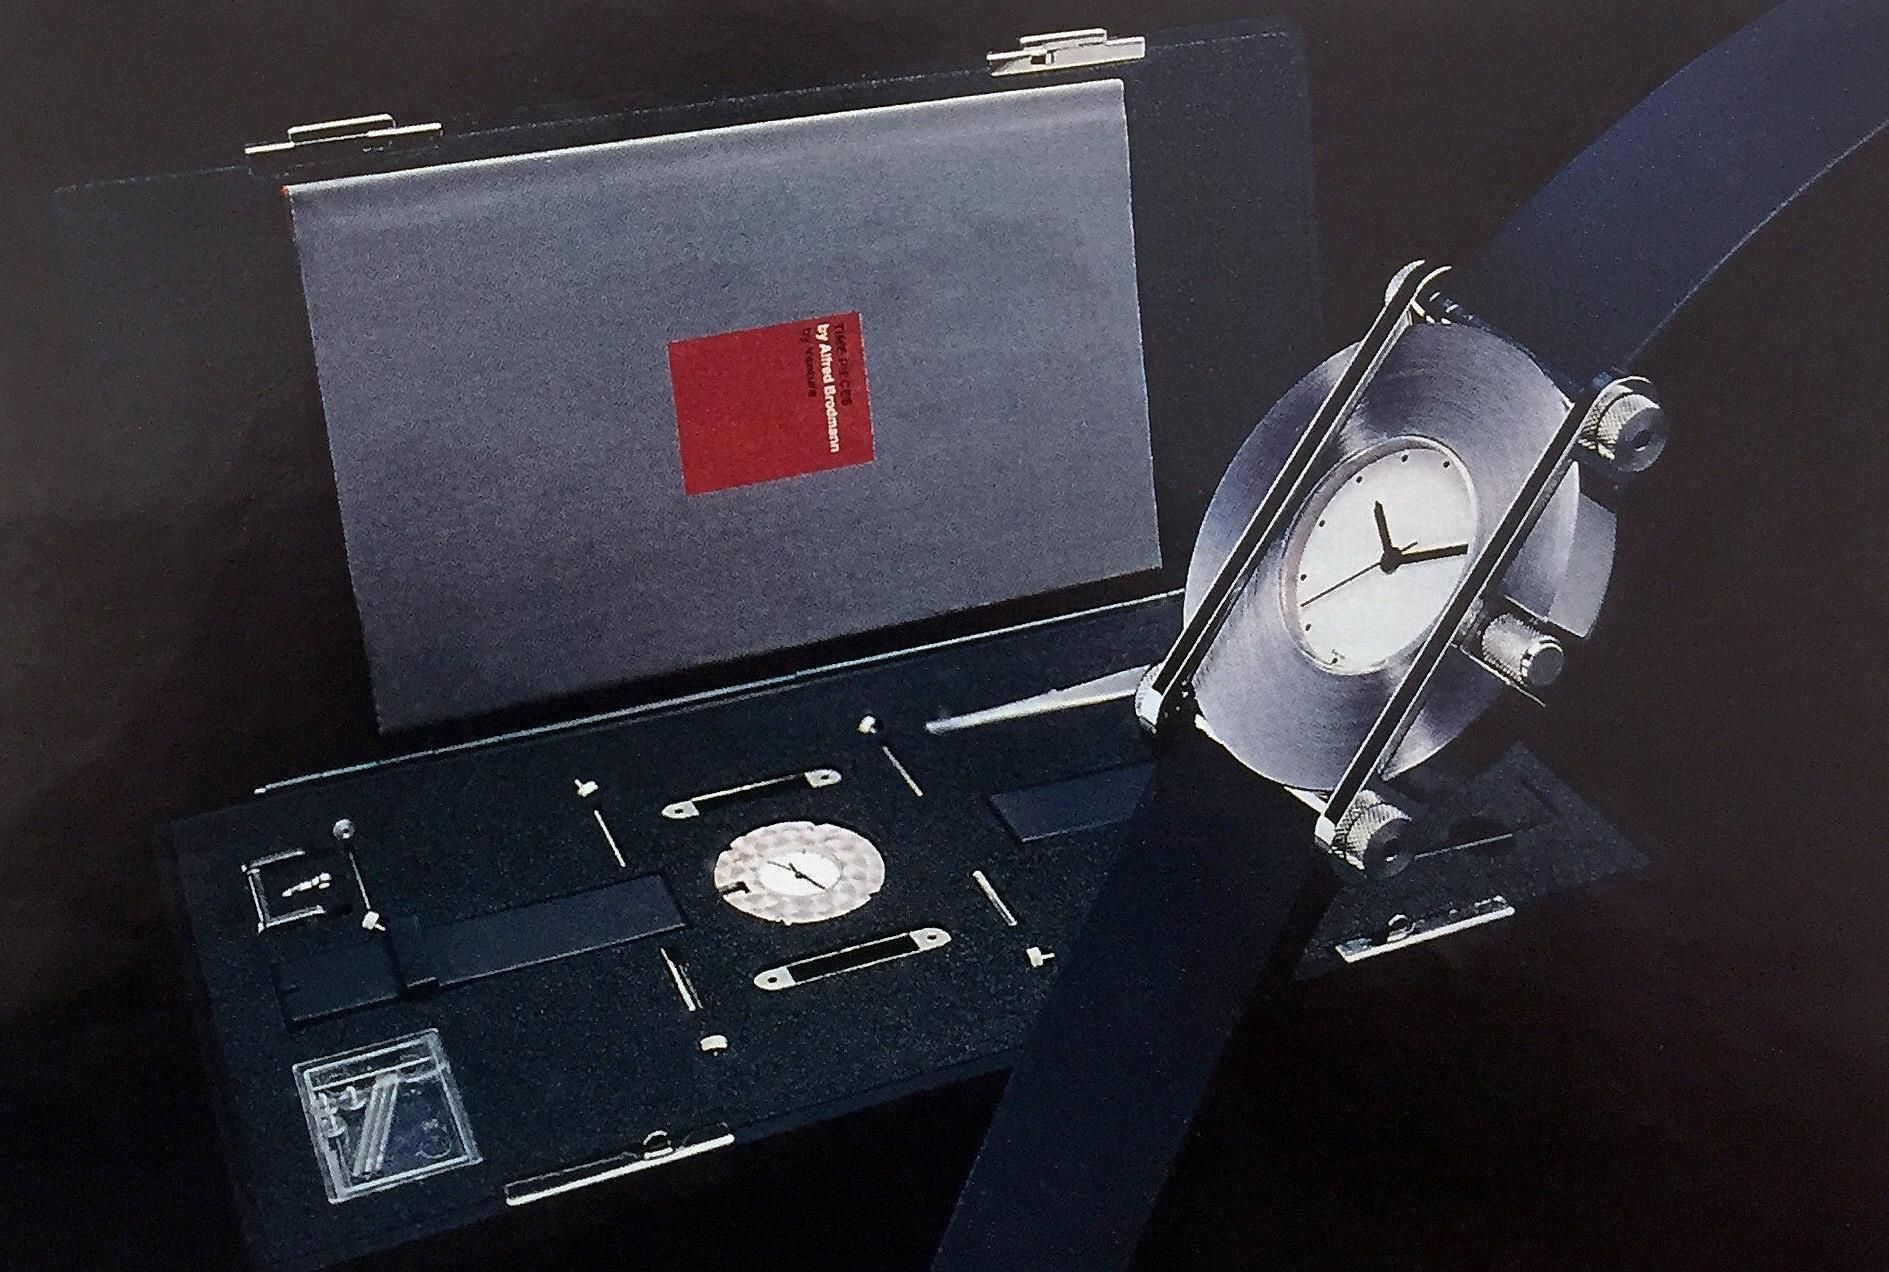 Timepieces.jpg